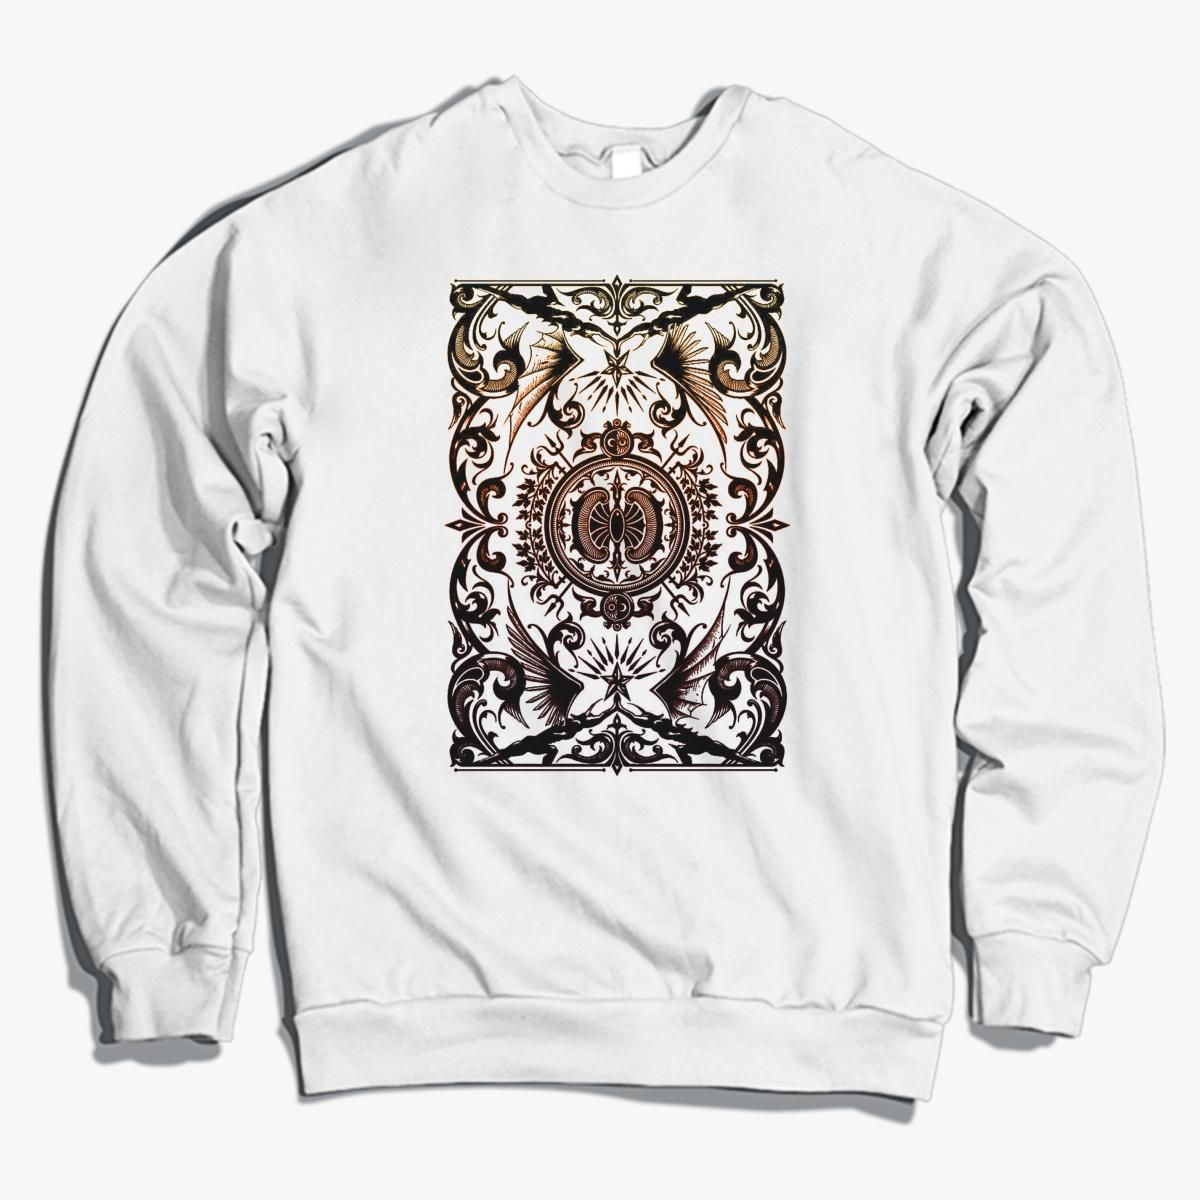 Abstact Batik Crewneck Sweatshirt